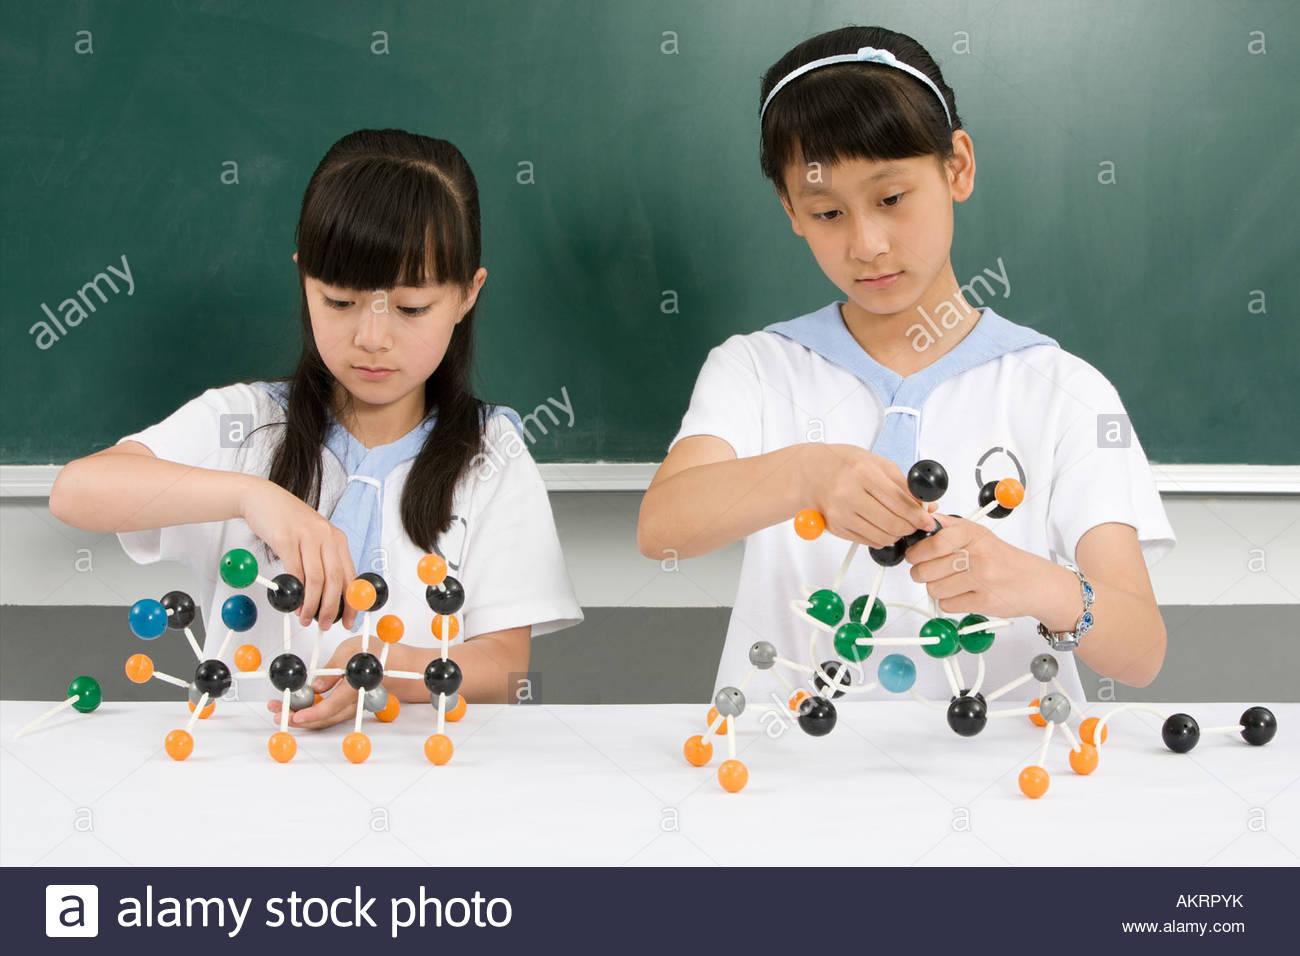 Two girls making chemistry models - Stock Image